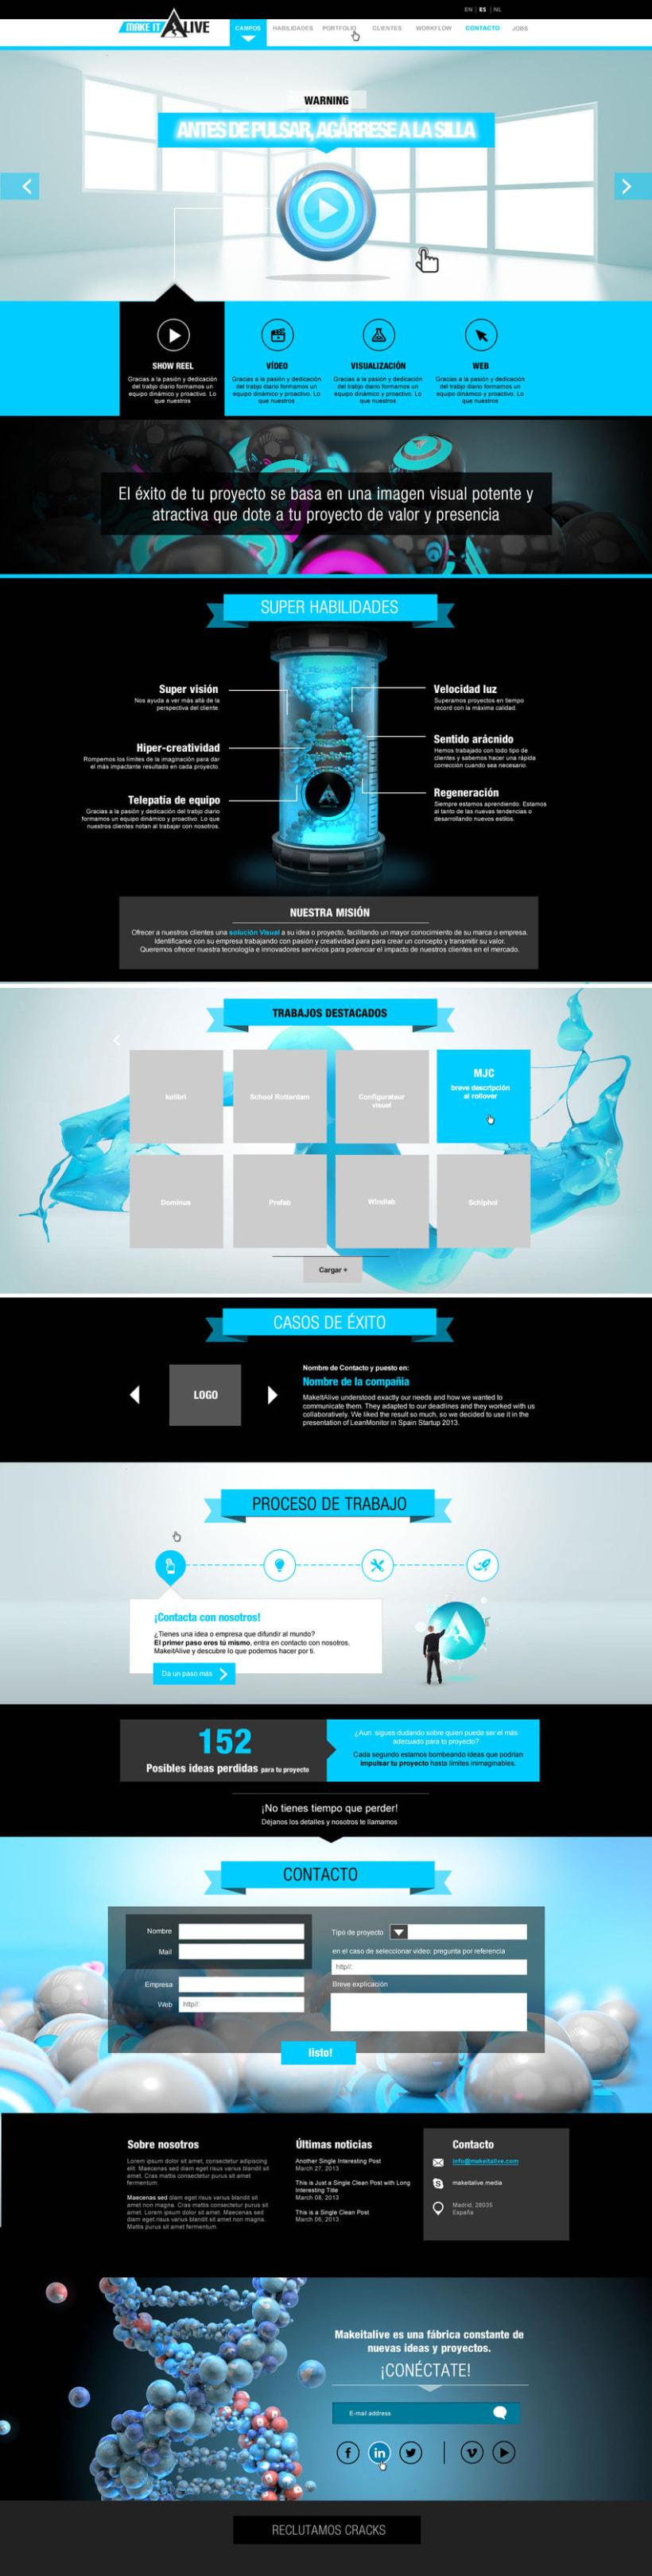 MakeitAlive - Web design & concept 1